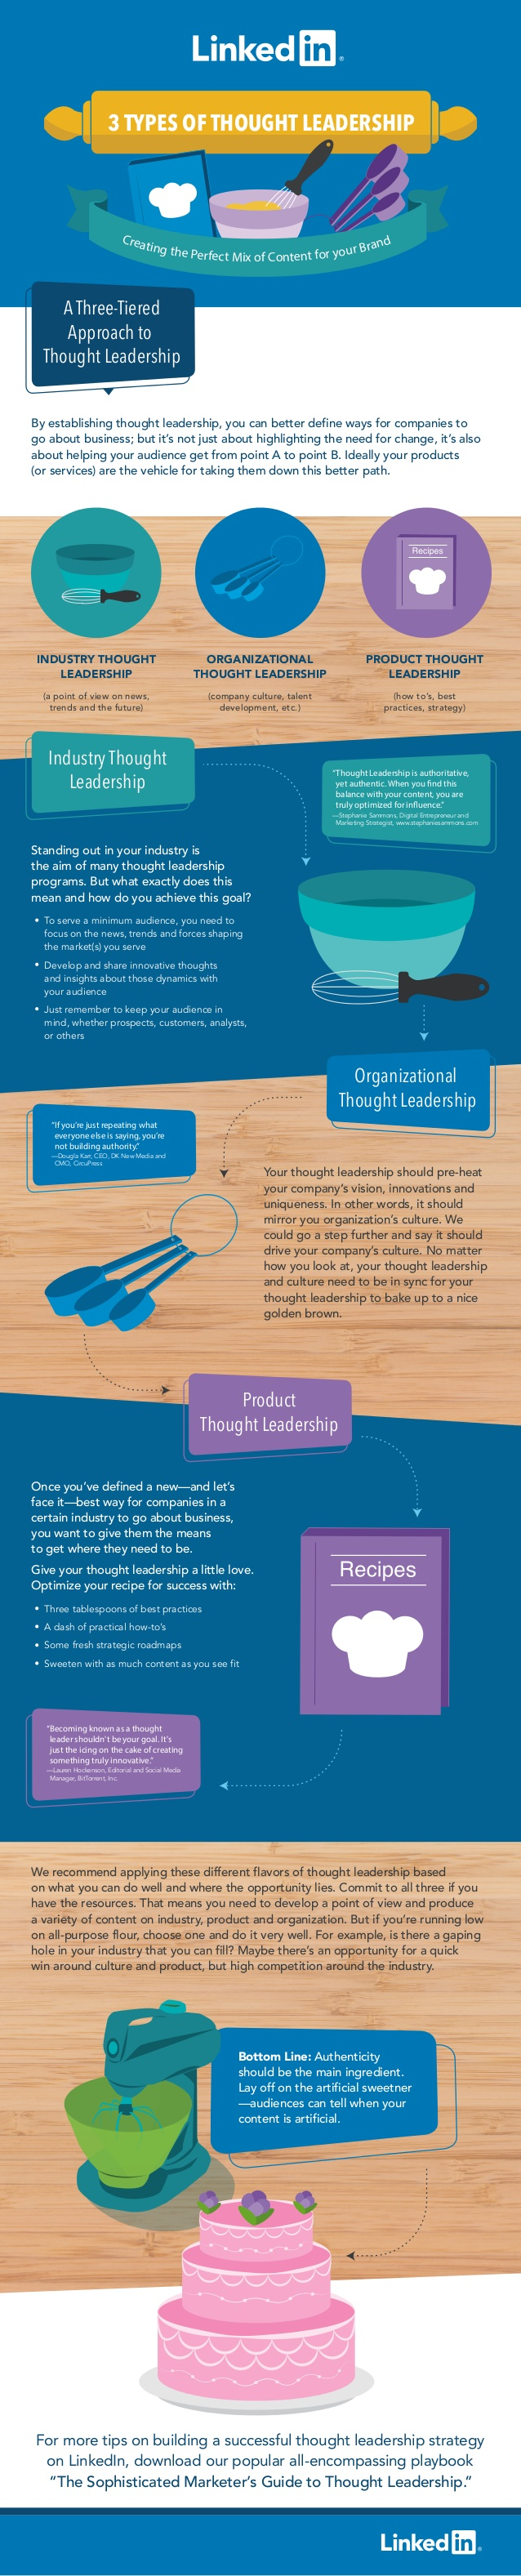 3 tipos de liderazgo intelectual